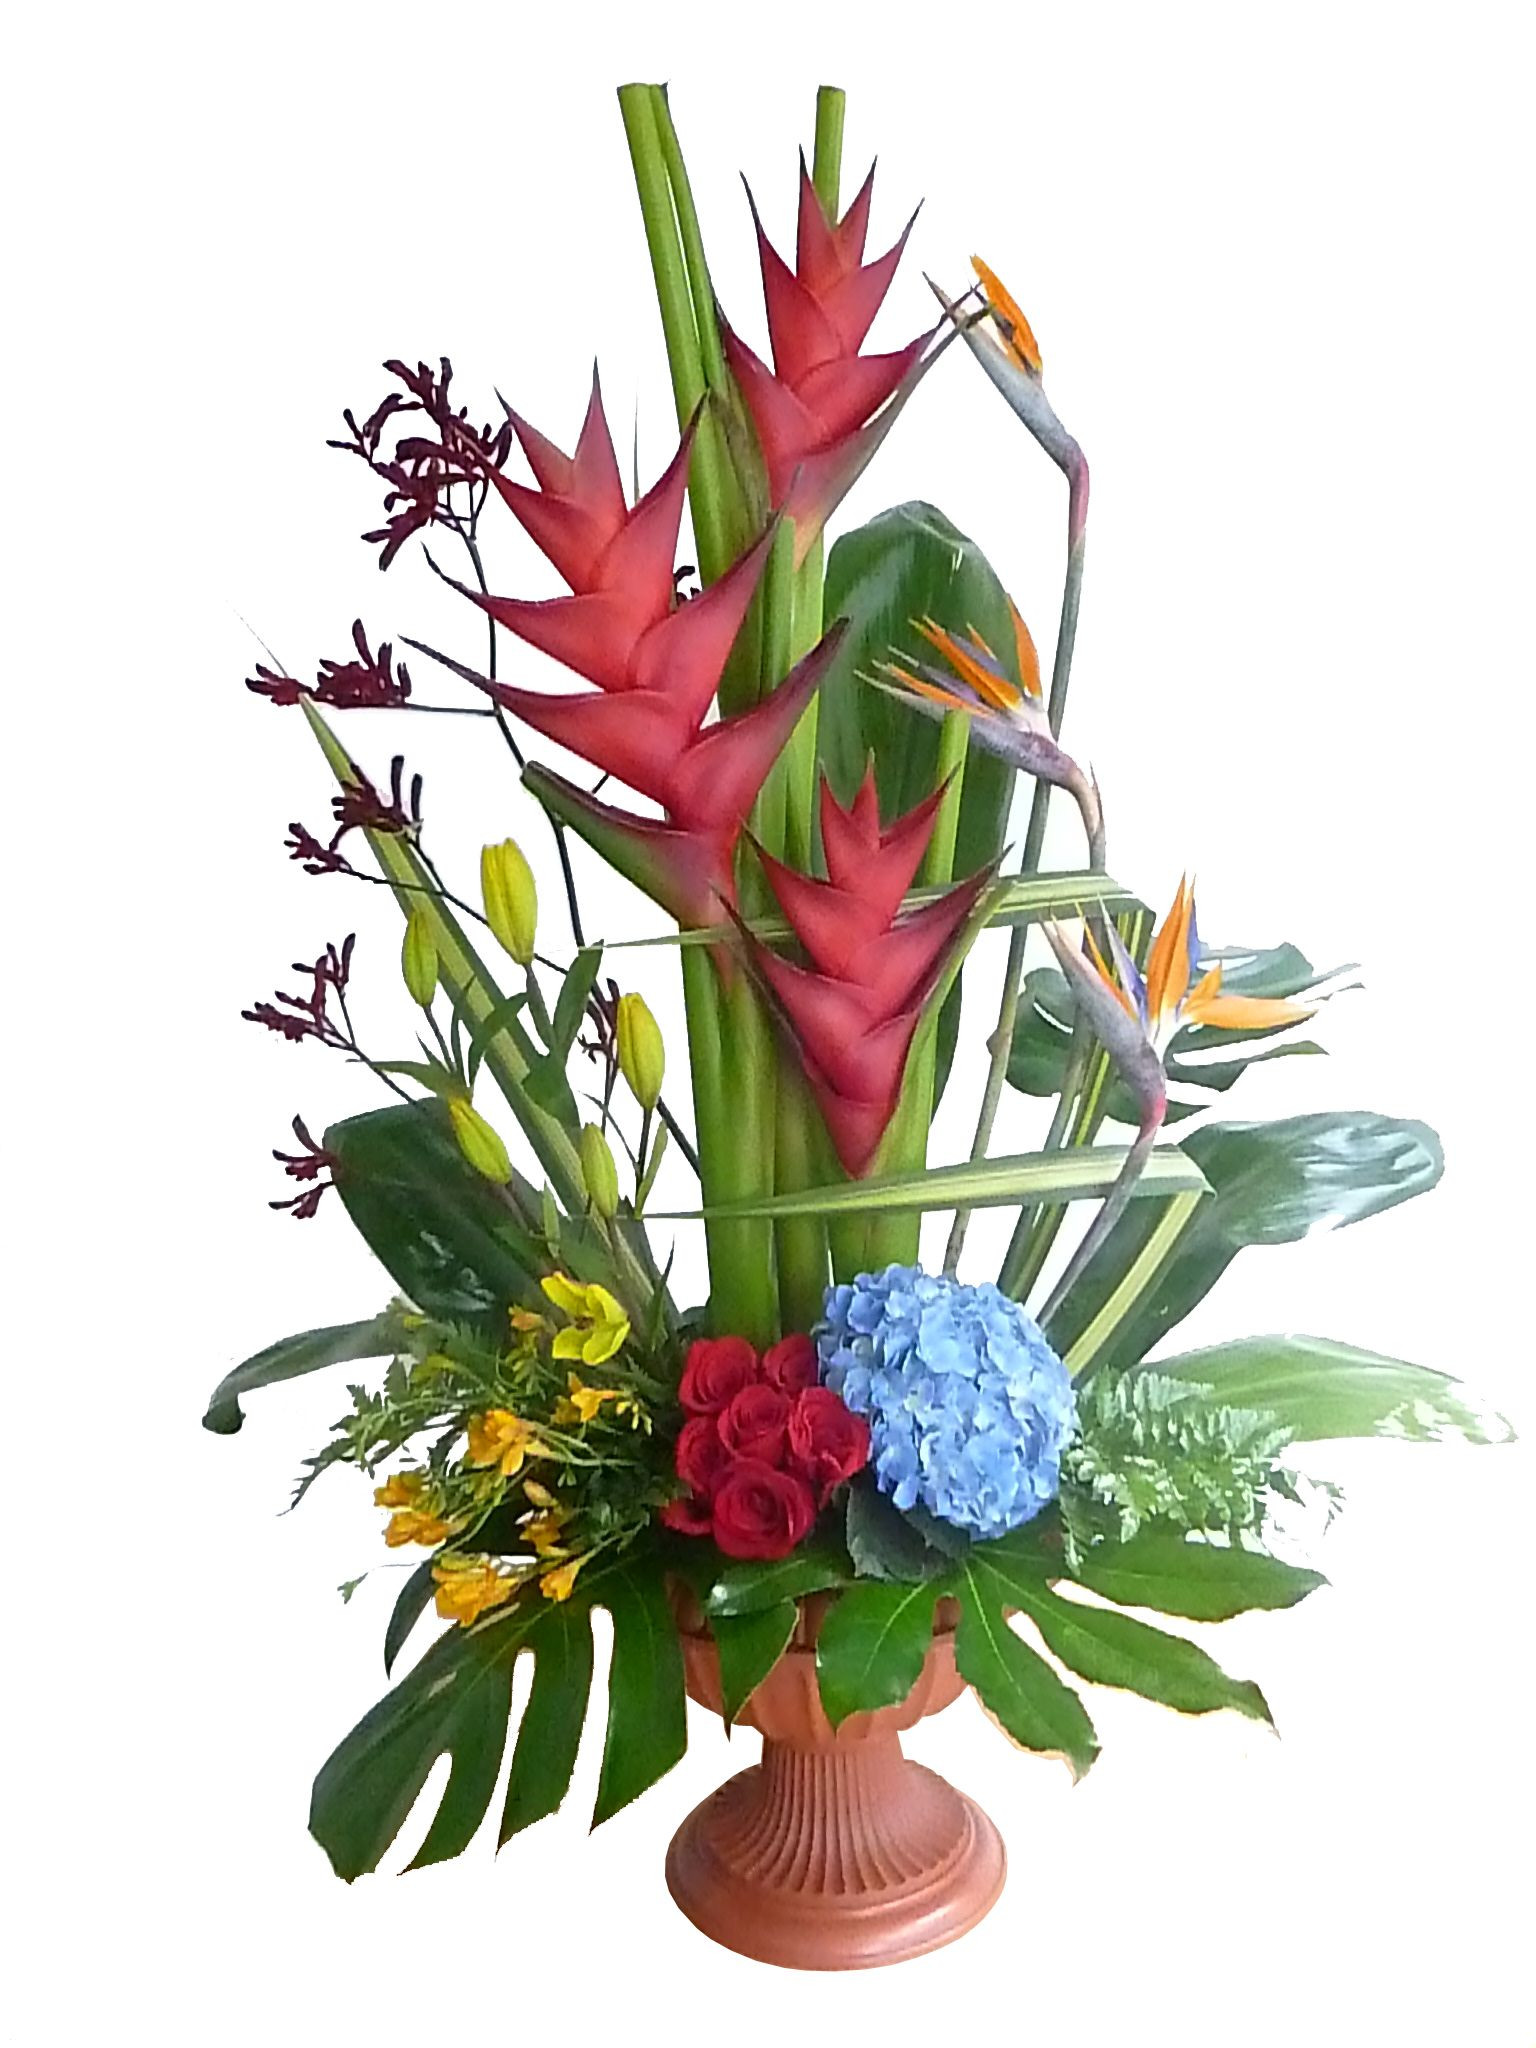 decoracion con flores exoticas helioconias aves de paraiso sobre base con clavel chino